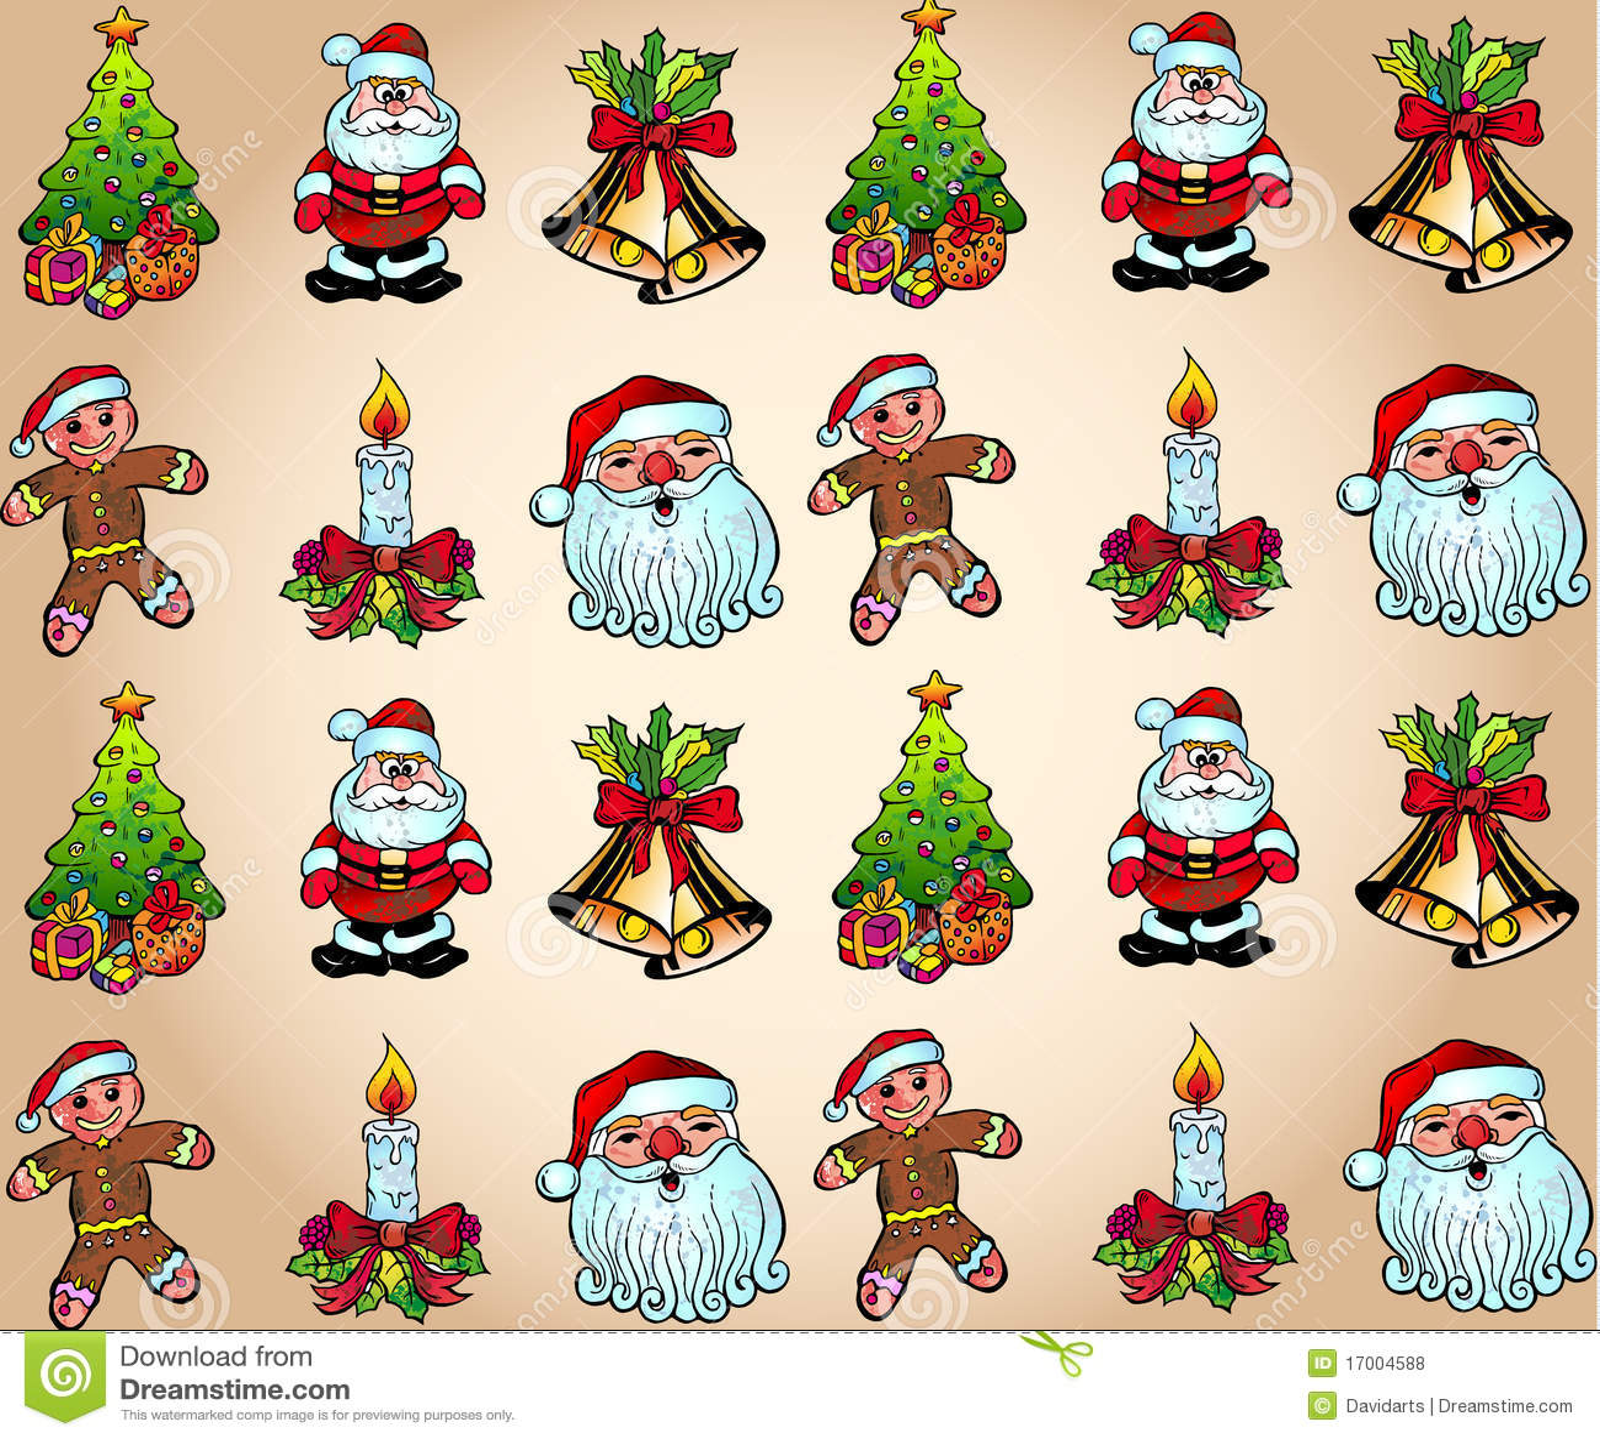 Christmas Design Wallpaper hd photo